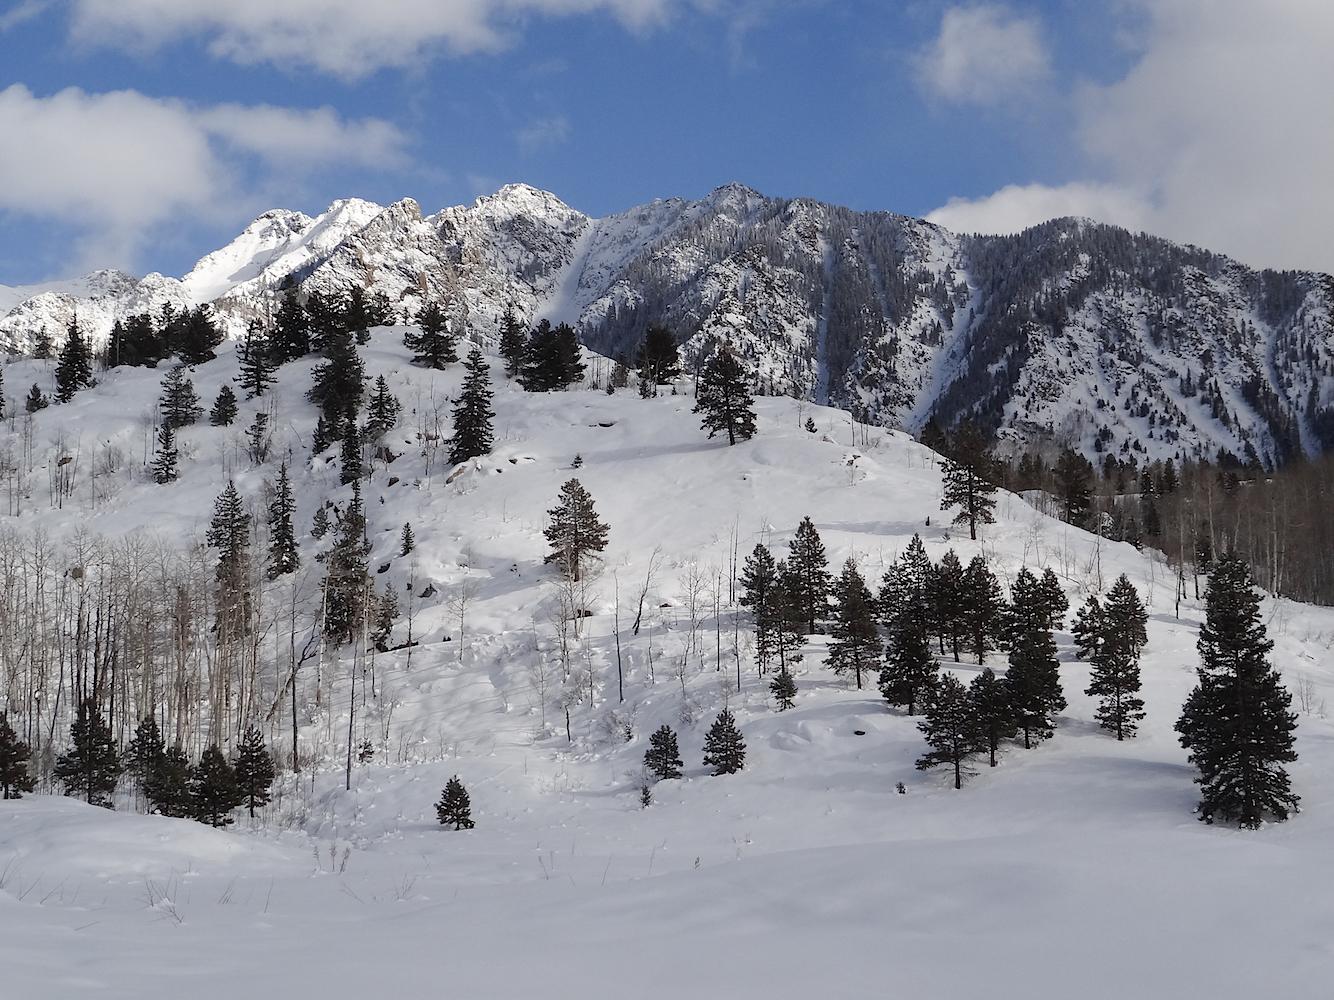 Lime Creek Road Snowshoe, Image #5342